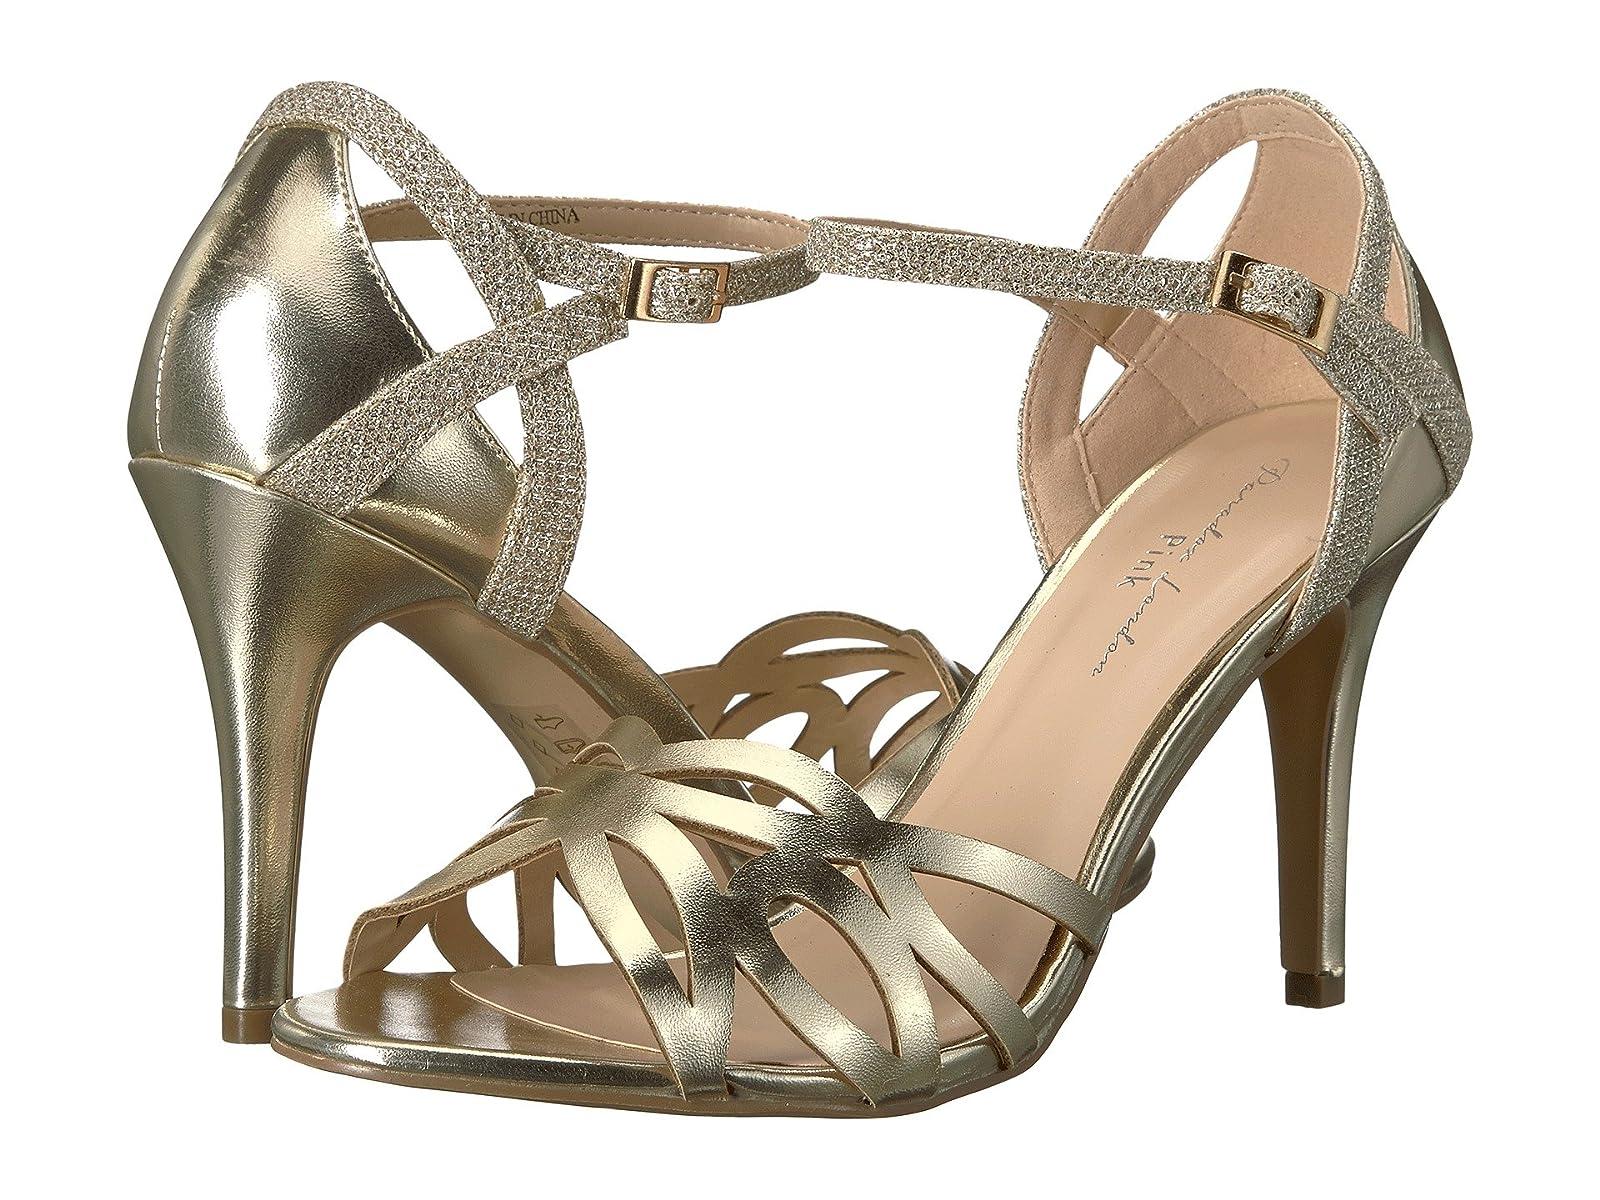 Paradox London Pink MonicaCheap and distinctive eye-catching shoes